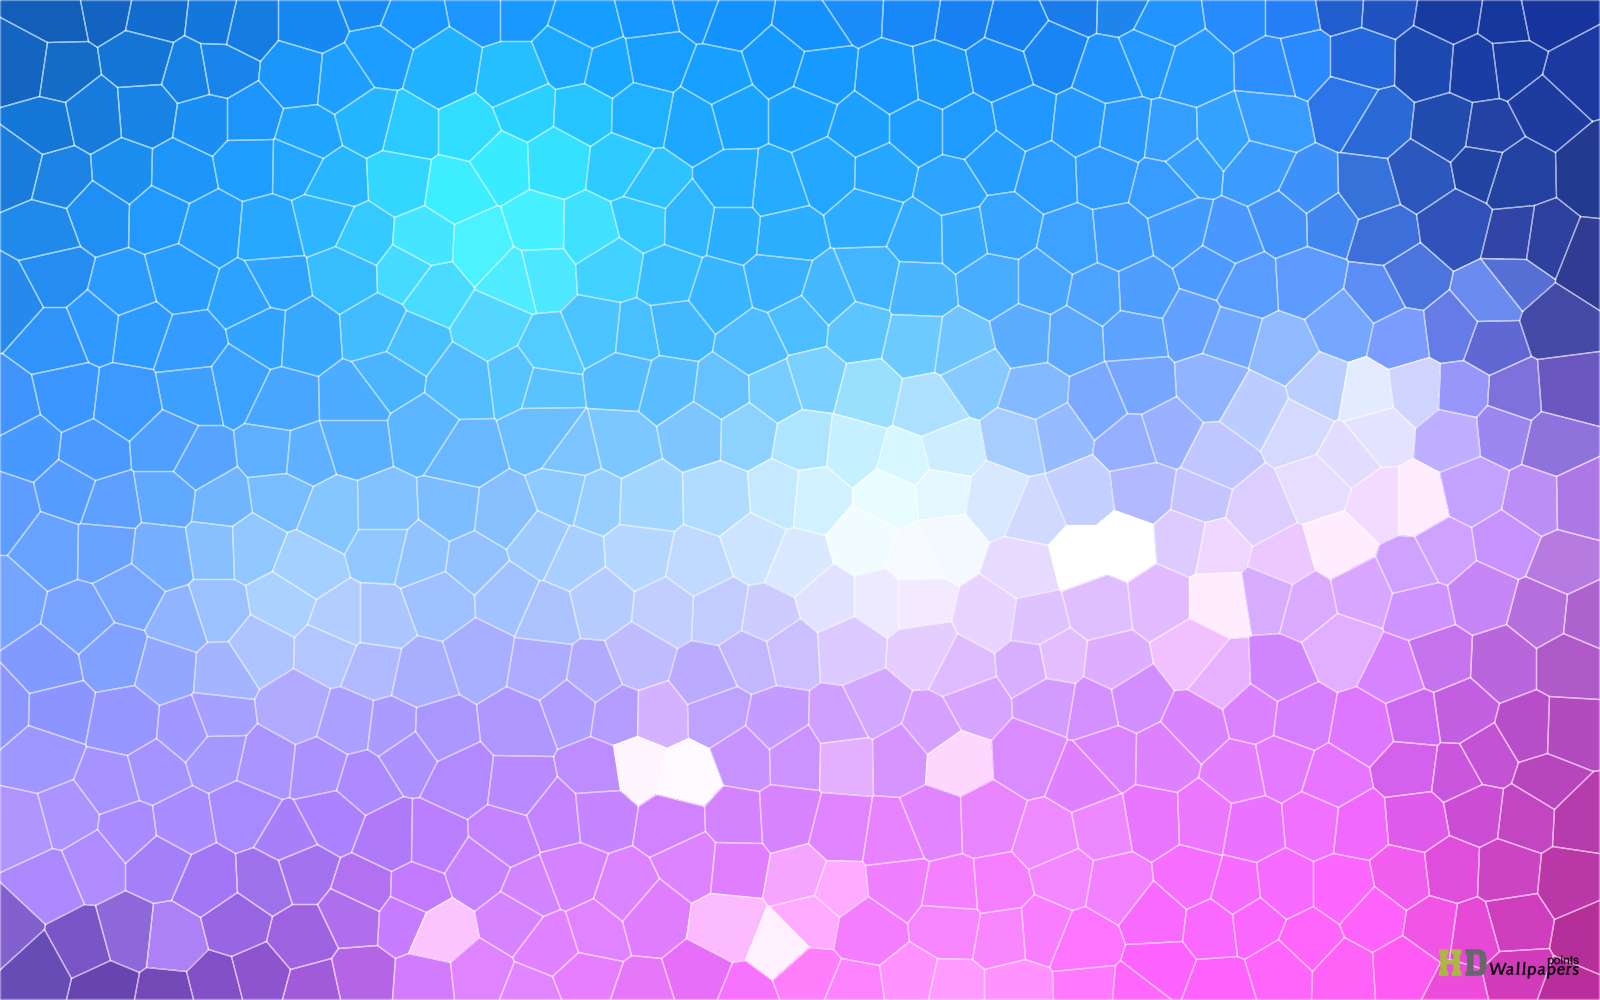 Light background design hd